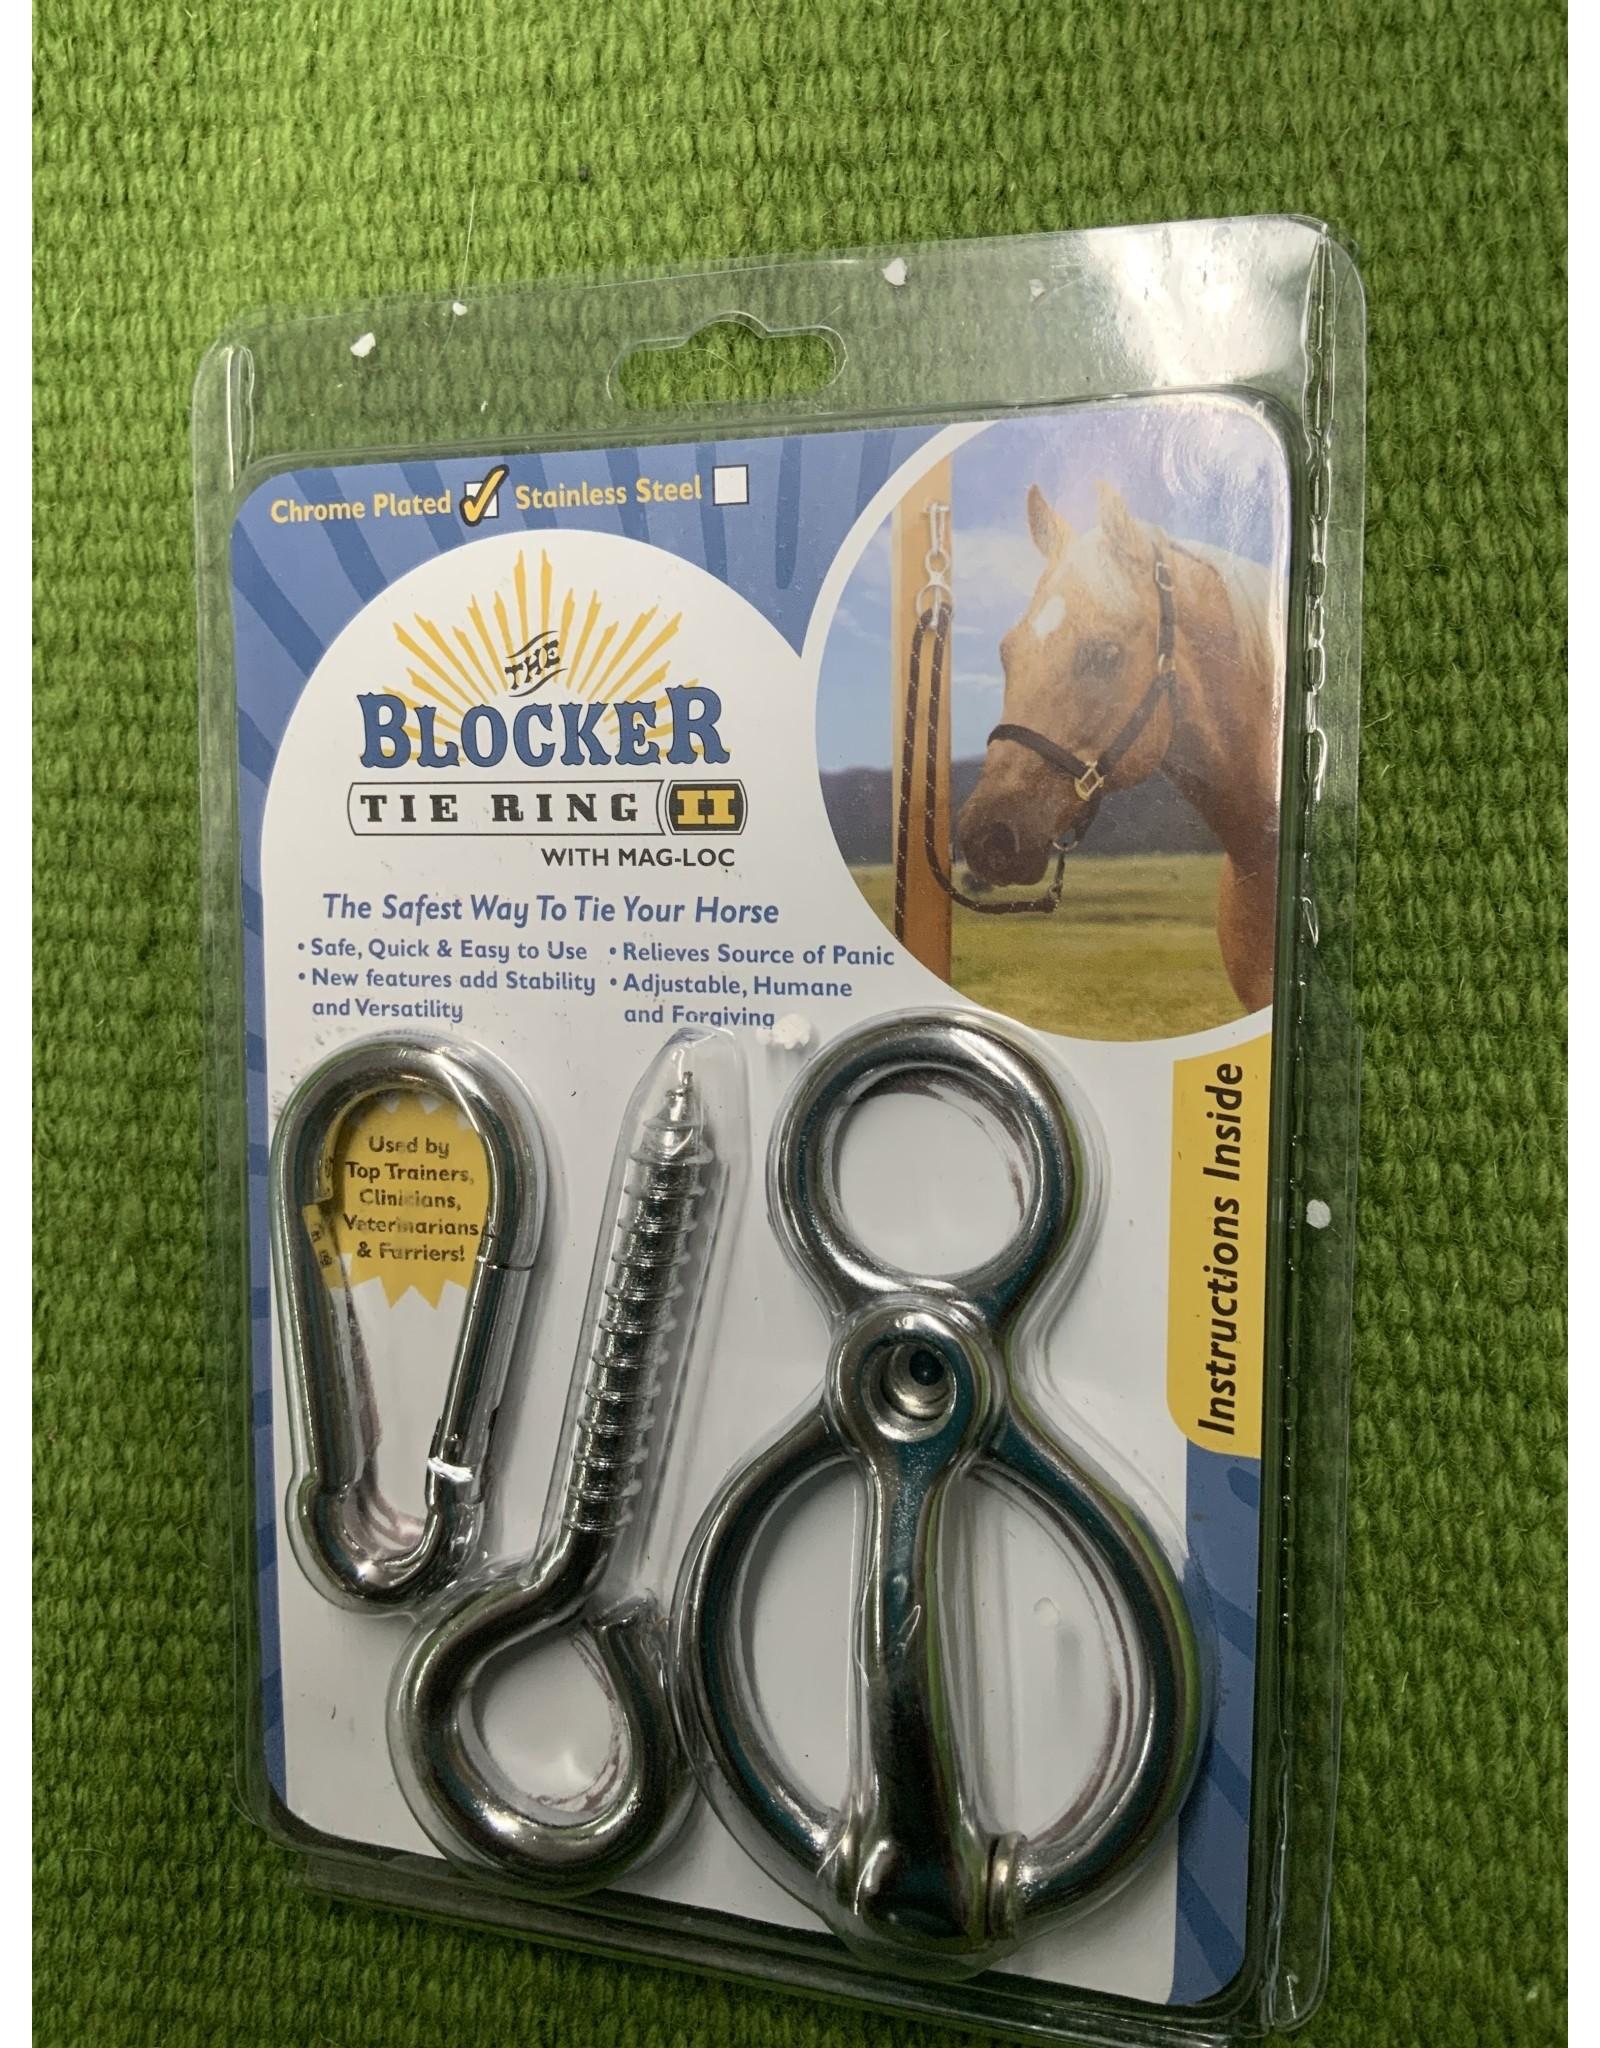 Chrome Blocker Tie Ring 11 - 10-340